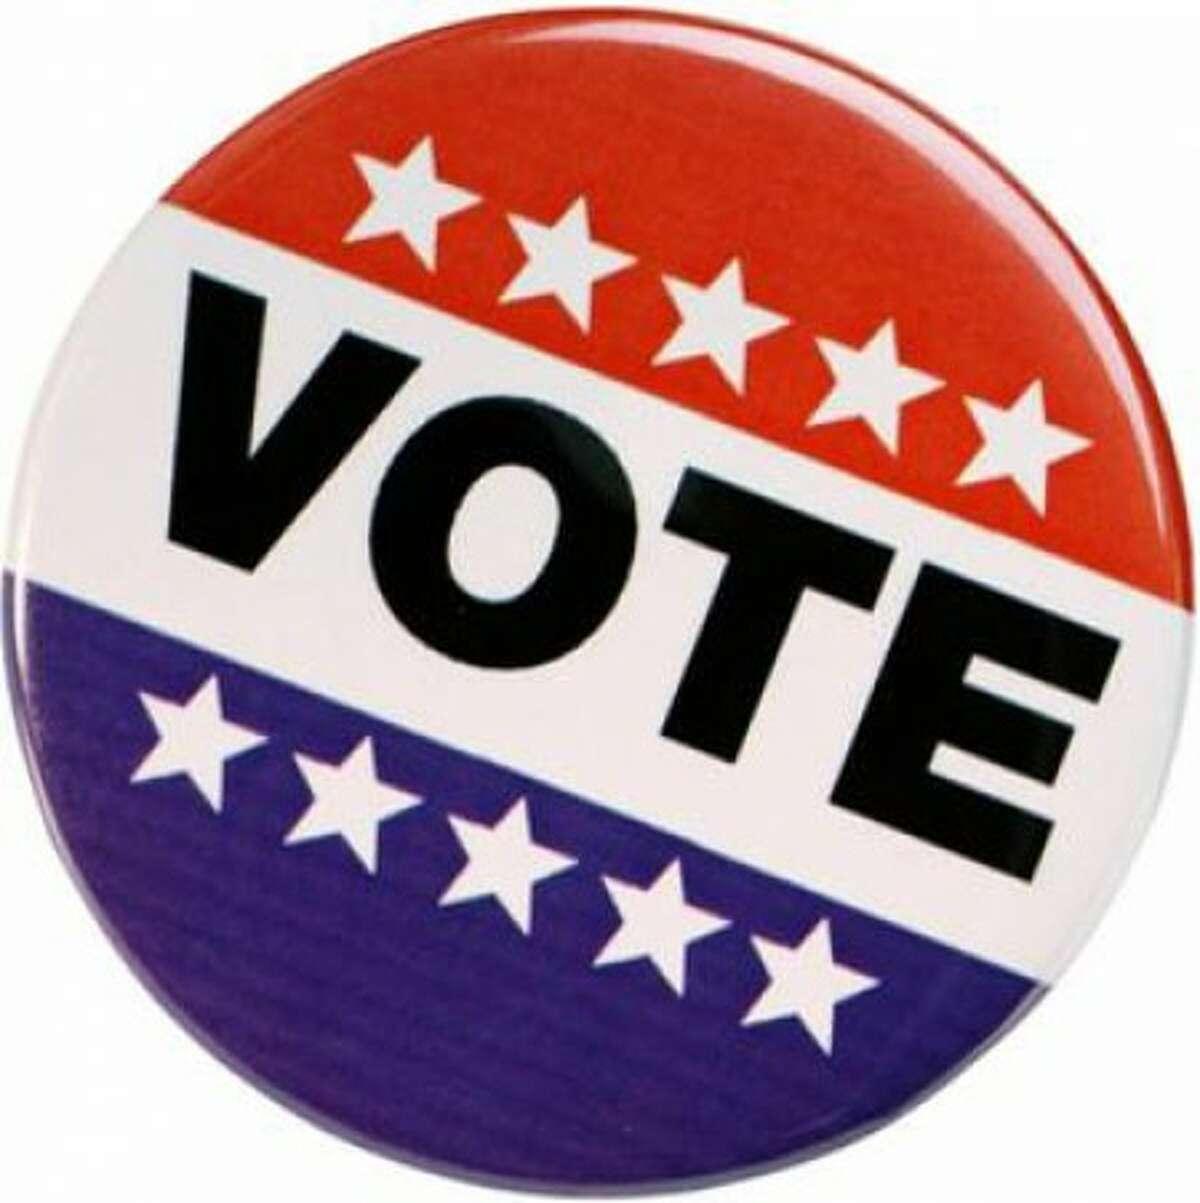 ELECTION 2010: Gardner running uncontested for registrar